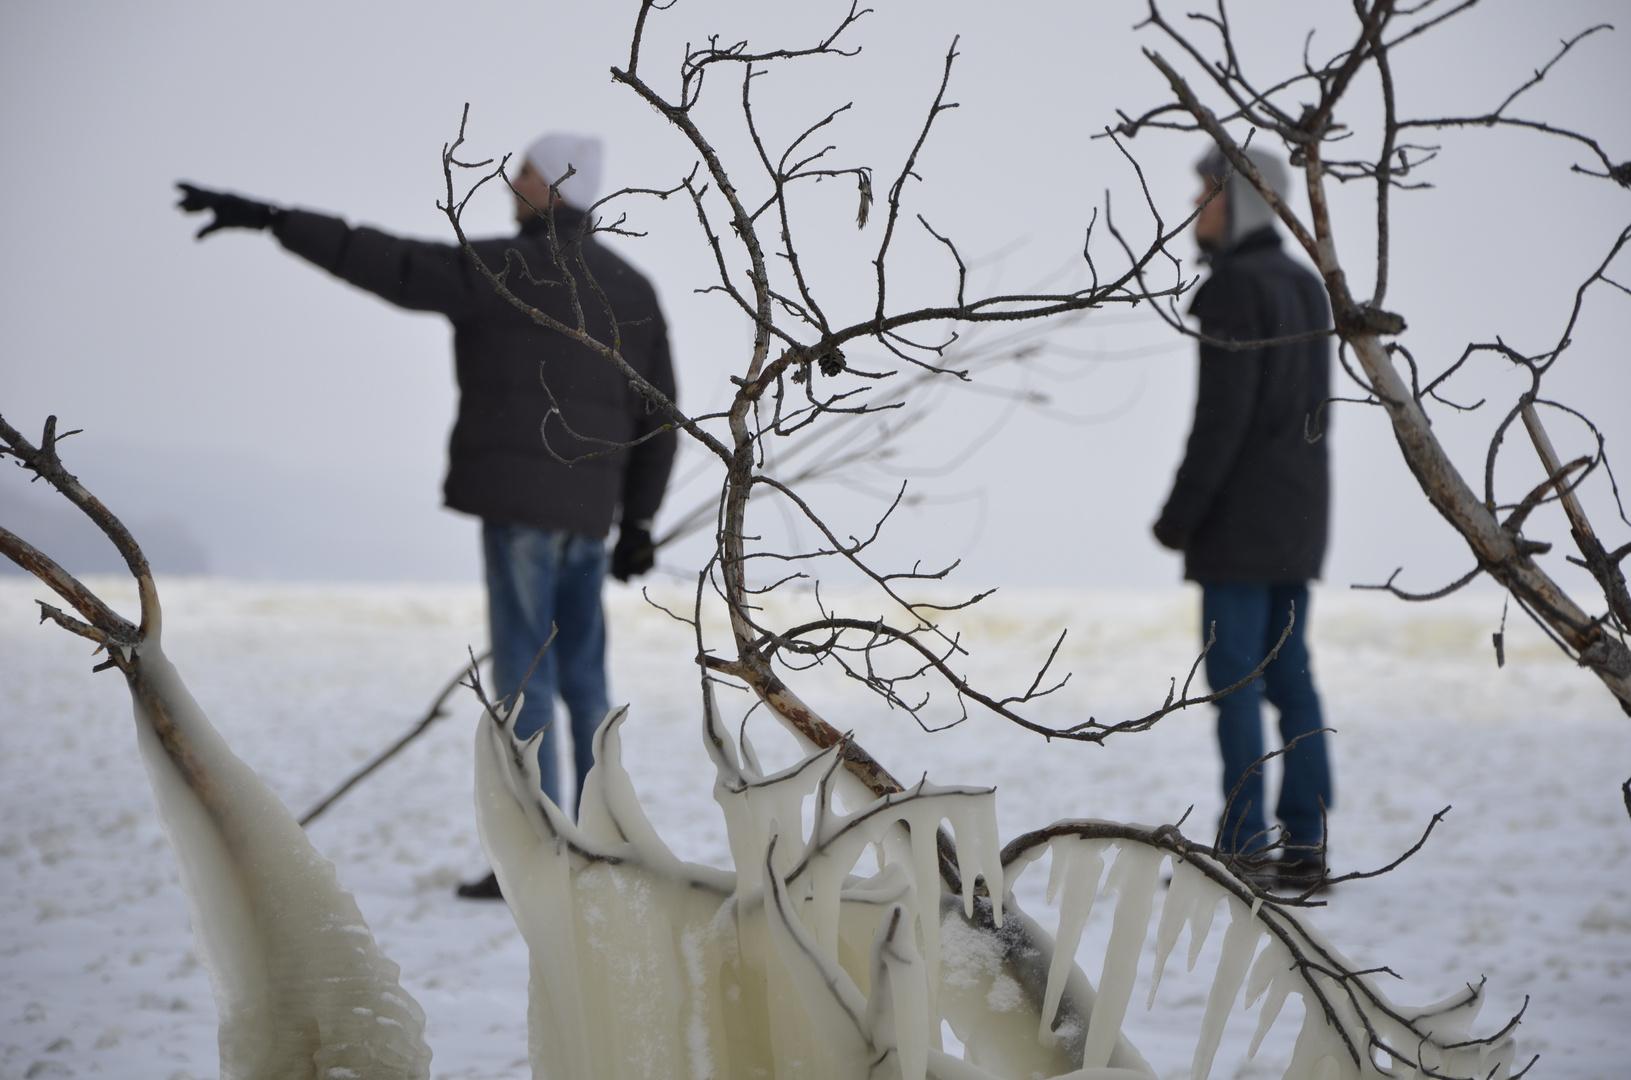 The icy Dnipro near Hrebeny village, Ukraine